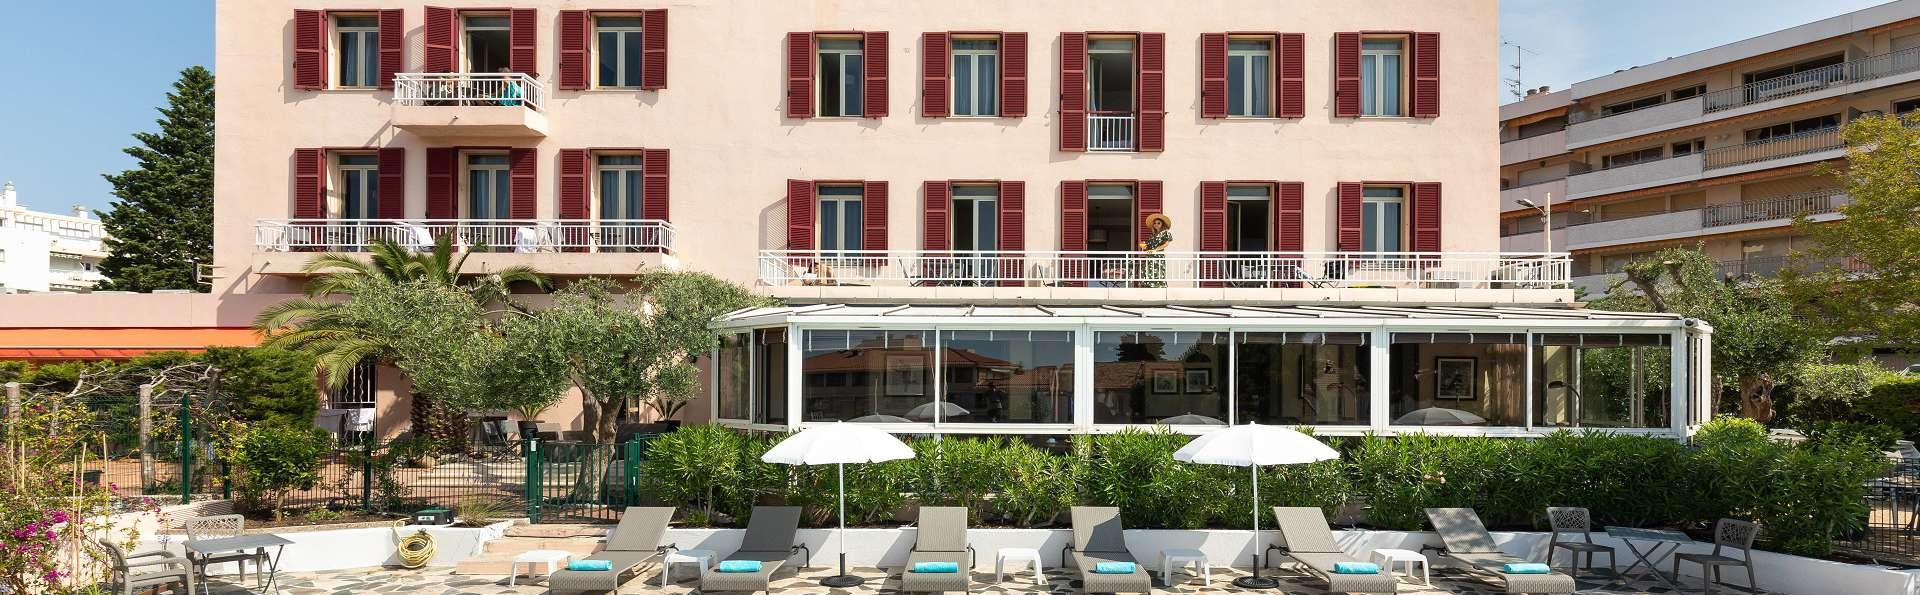 The Originals Boutique, Hôtel des Orangers, Cannes (Inter-Hotel) - i-Orangers_06-2020_HD-001.jpg